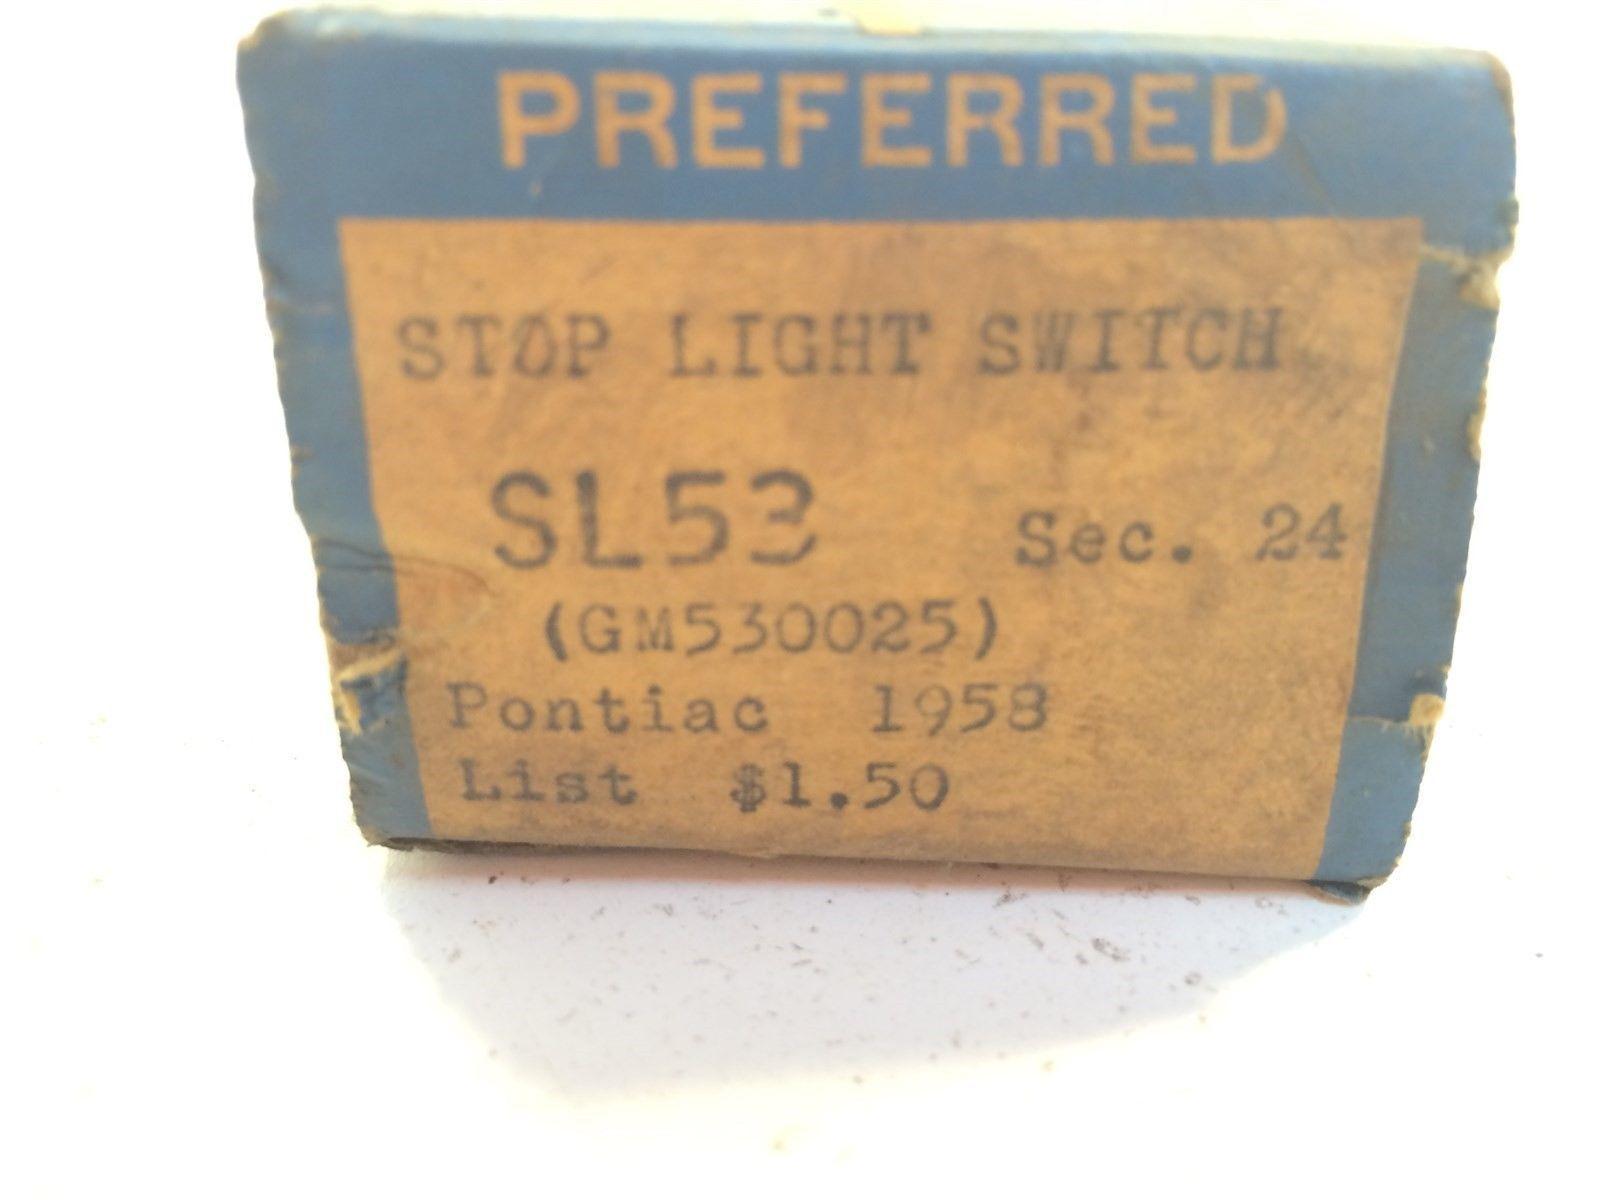 Vintage Preferred SL53 Sec. 24 Stop Light Switch GM530025 1958 Pontiac